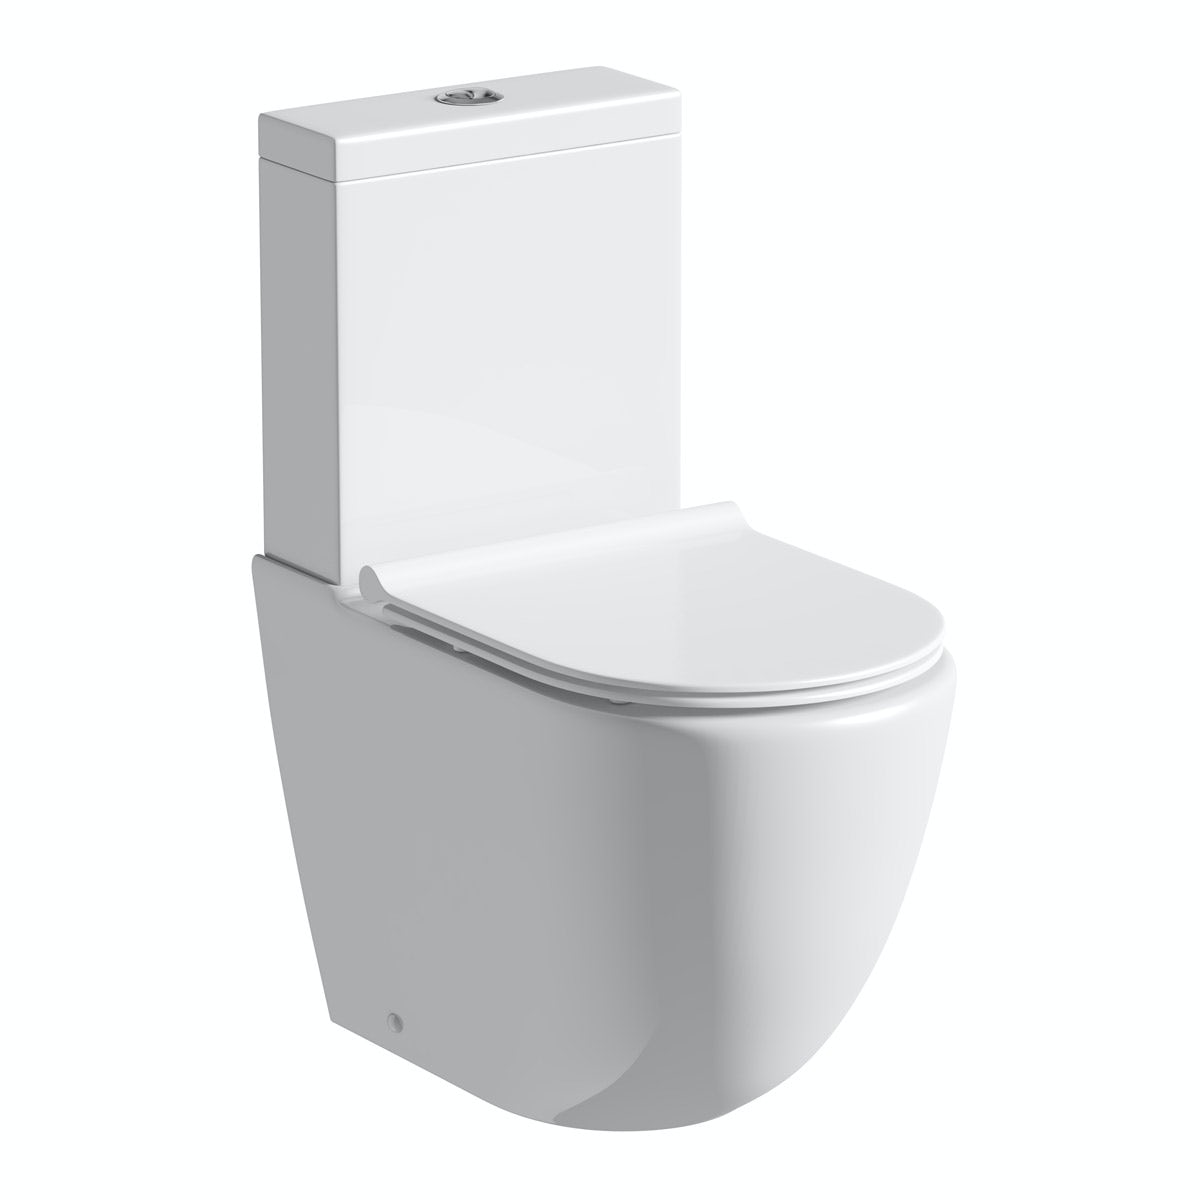 Mode Harrison close coupled toilet inc slimline soft close seat